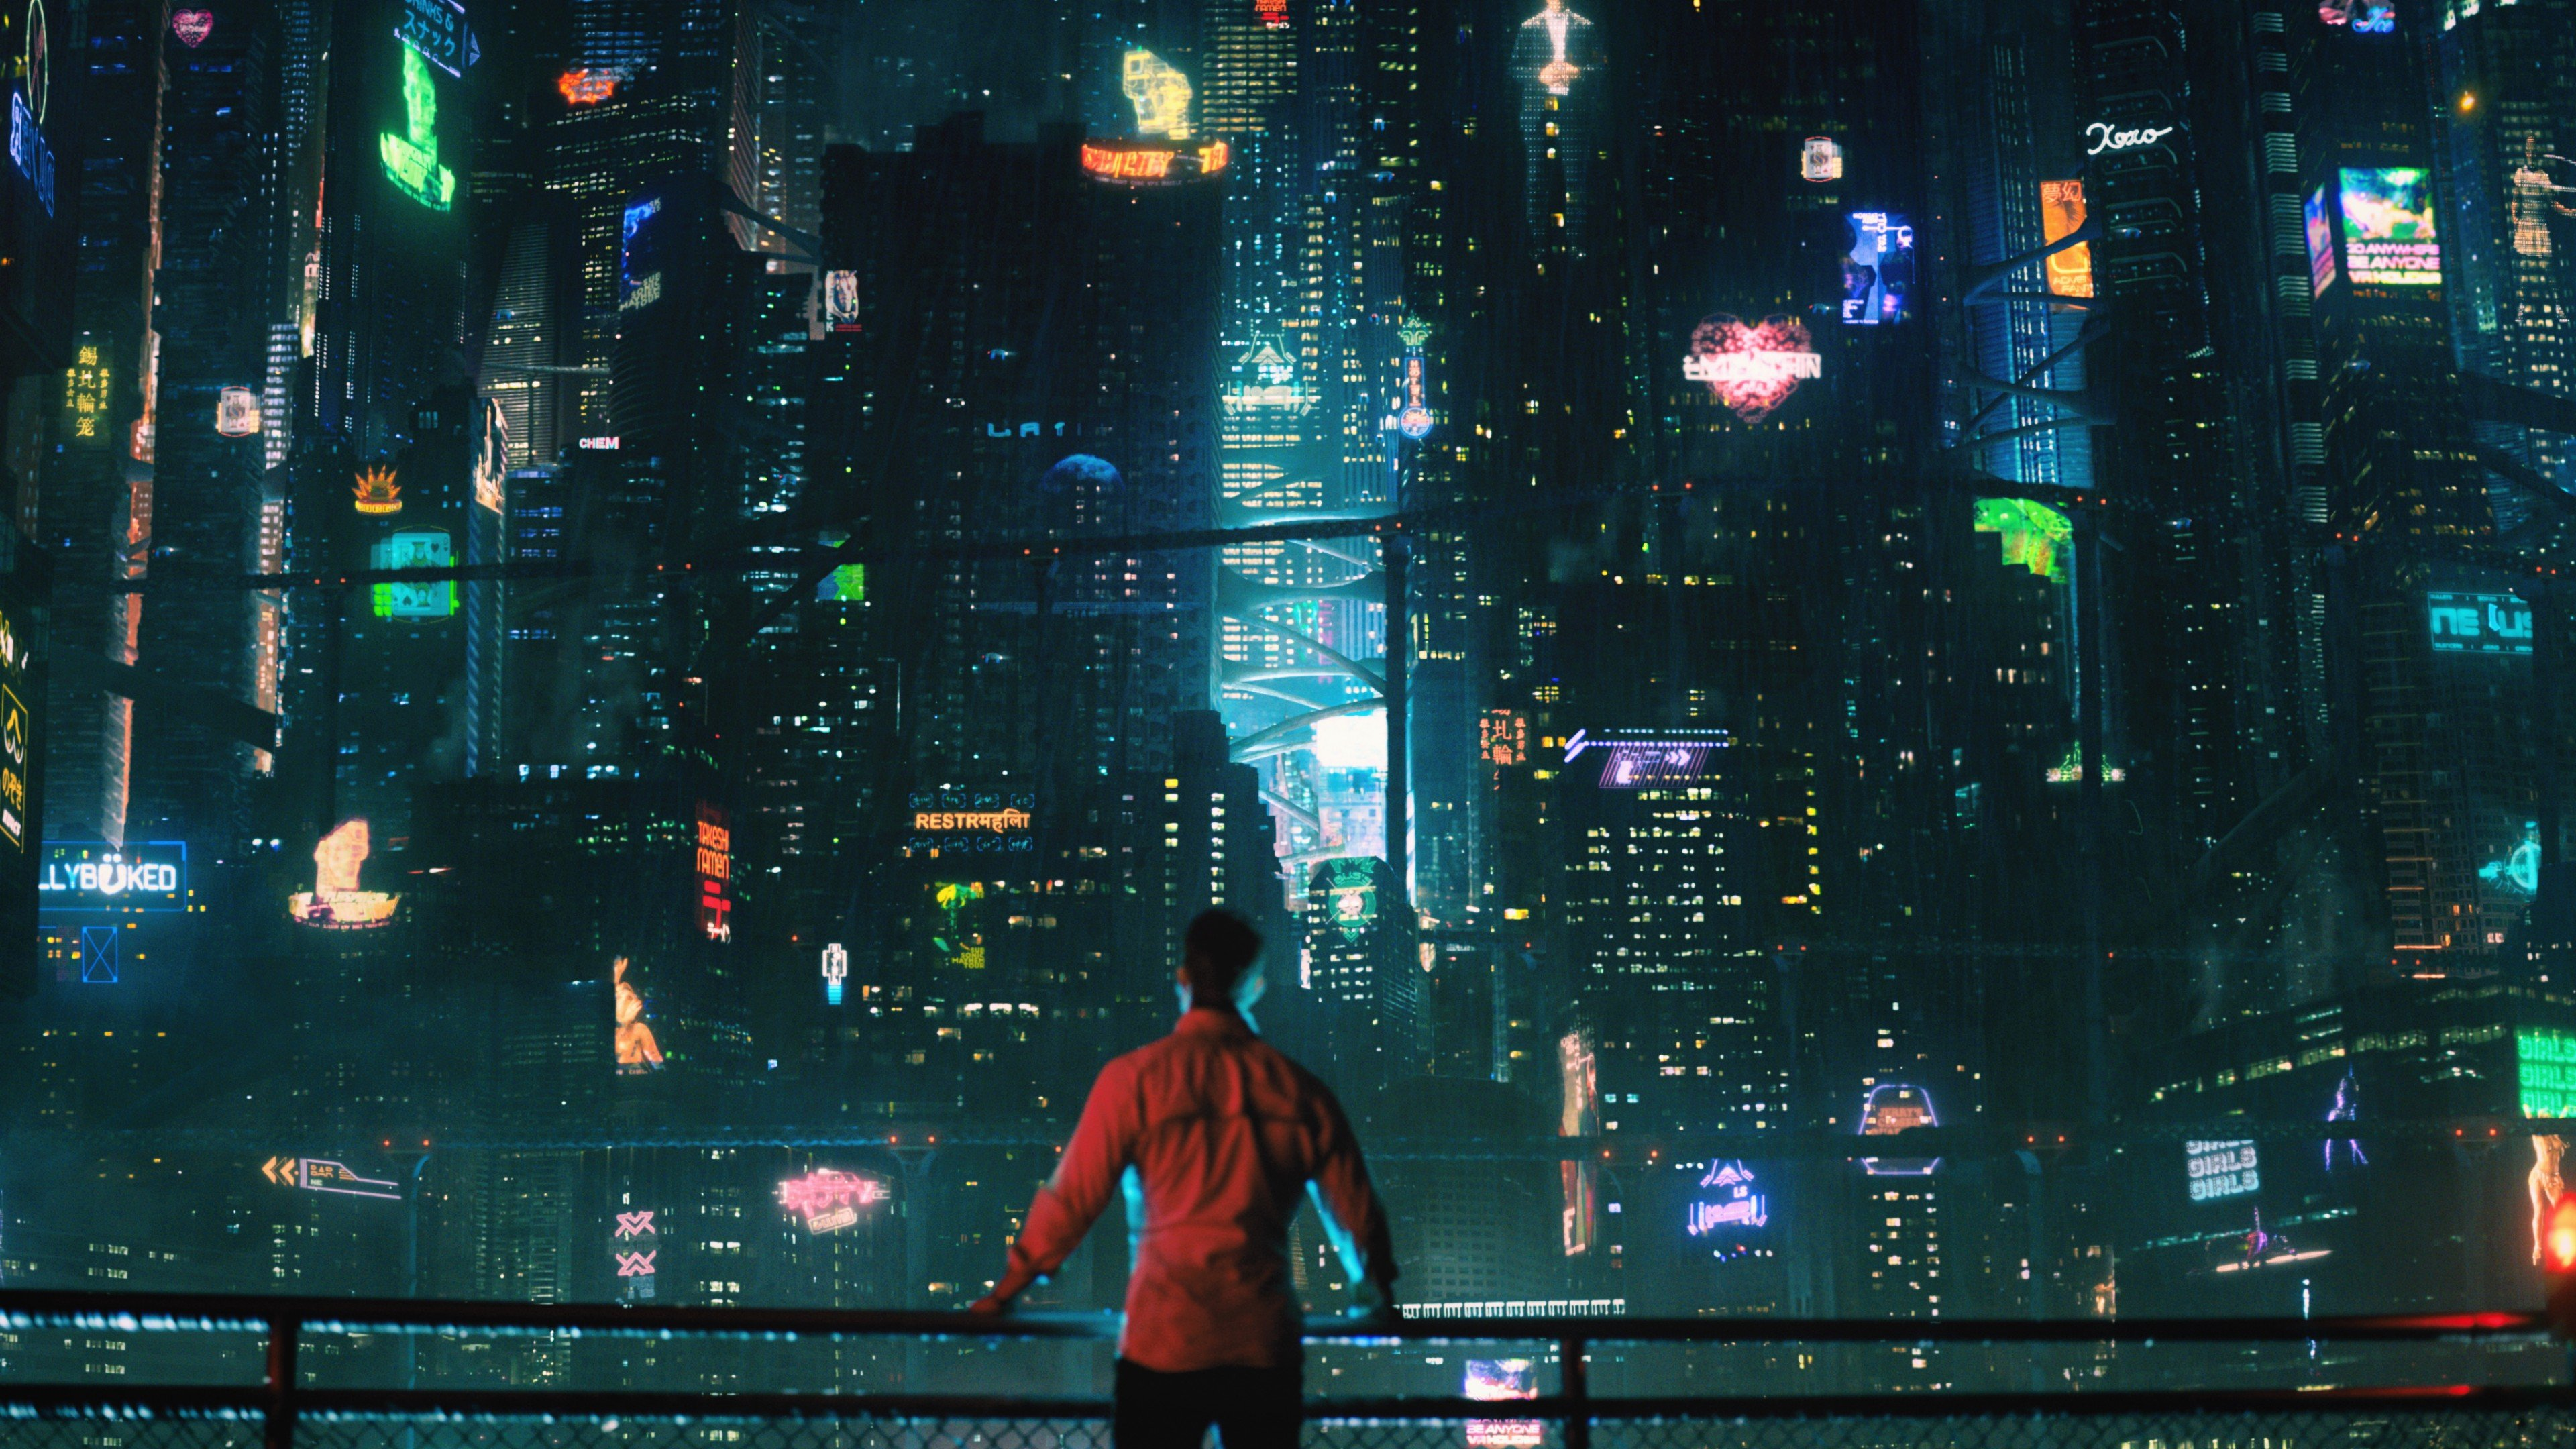 Cyberpunk Styled City 4k Wallpaper